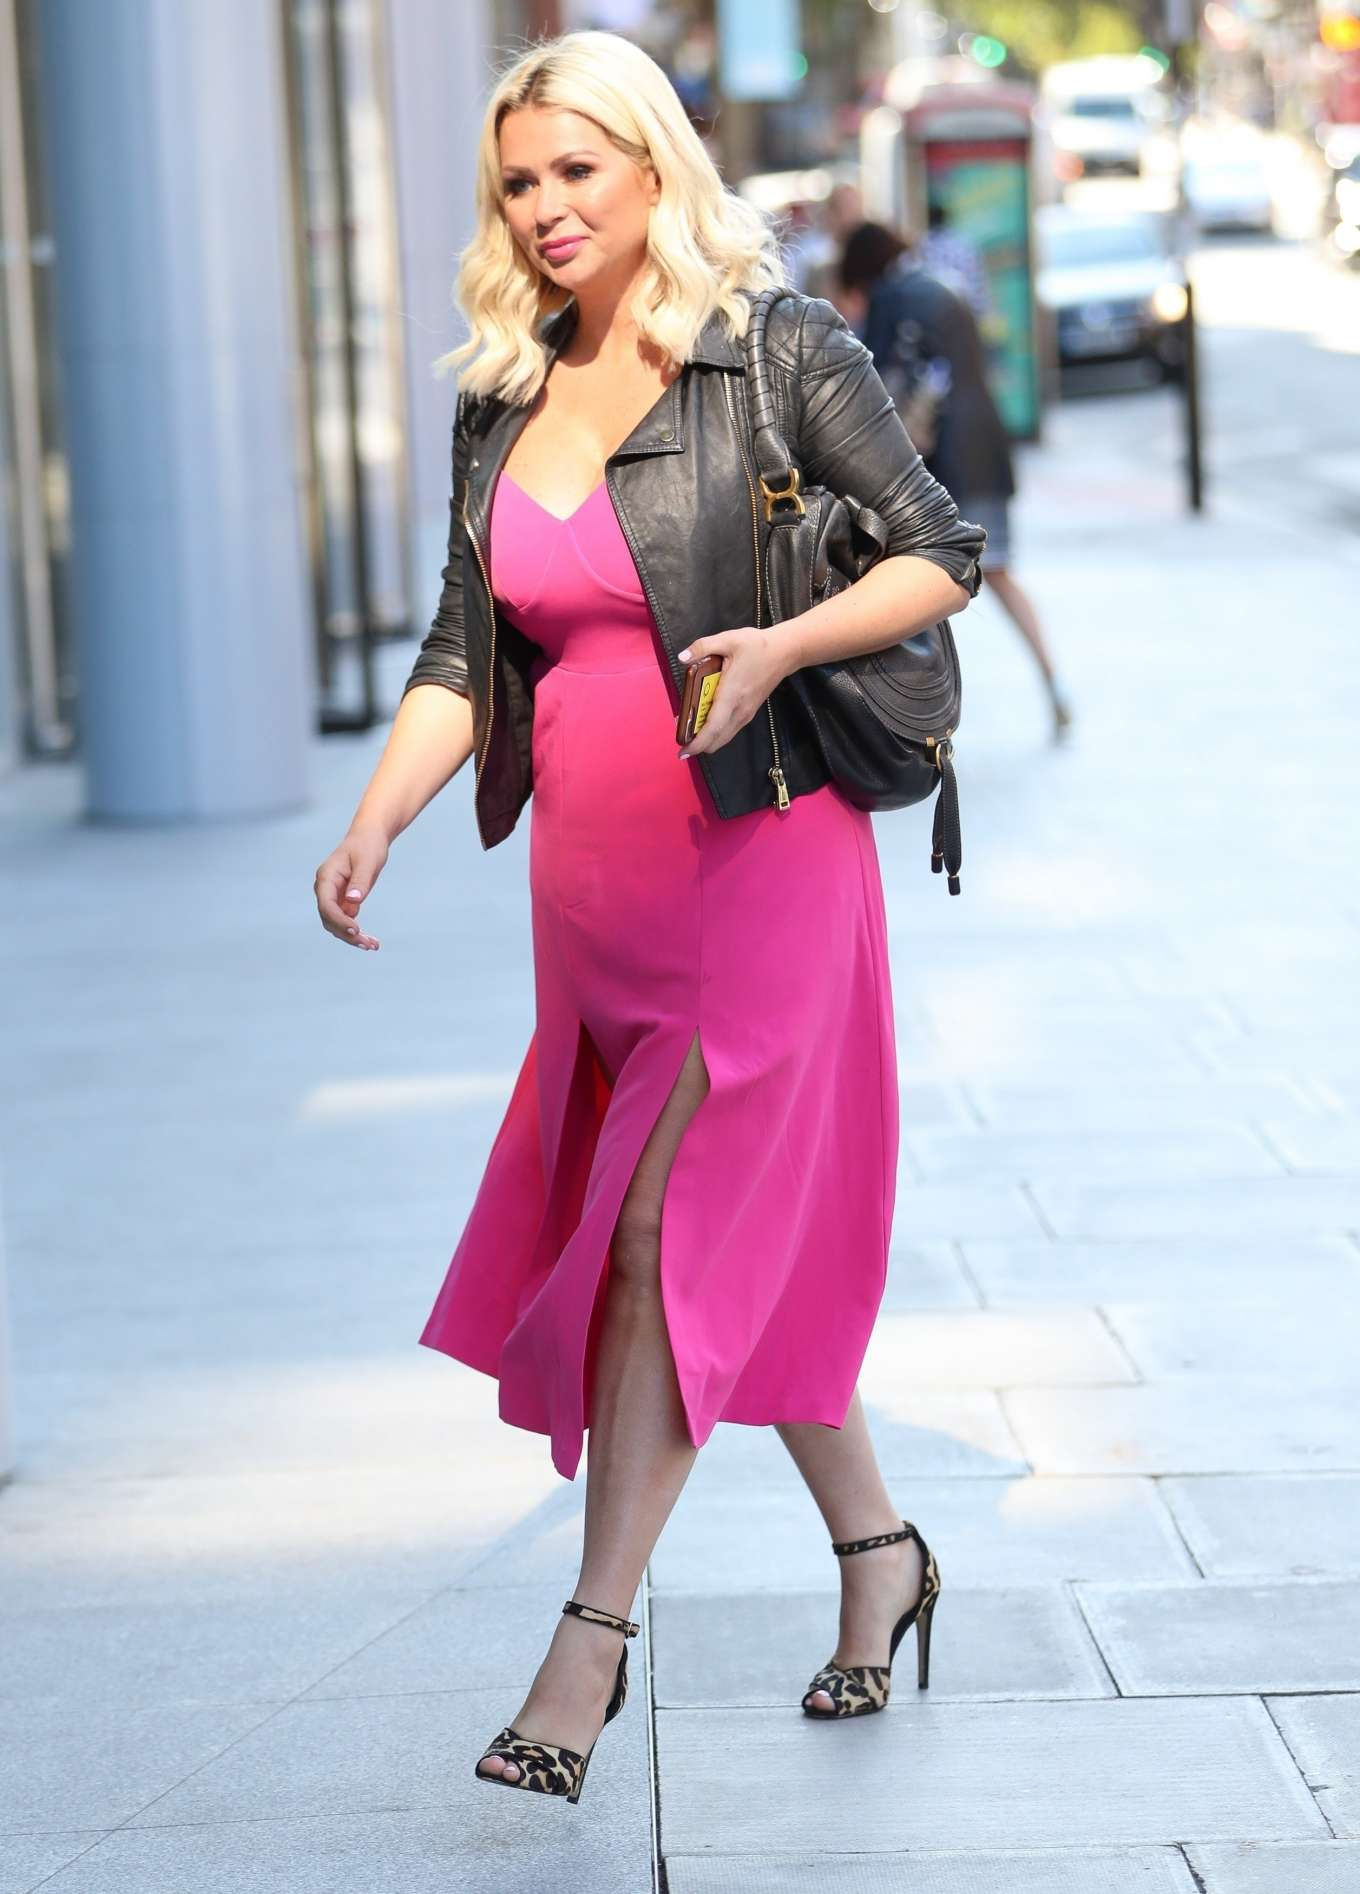 Nicola McLean 2019 : Nicola Mclean – In flirty pink dress exits Jeremy Vine show in London-11